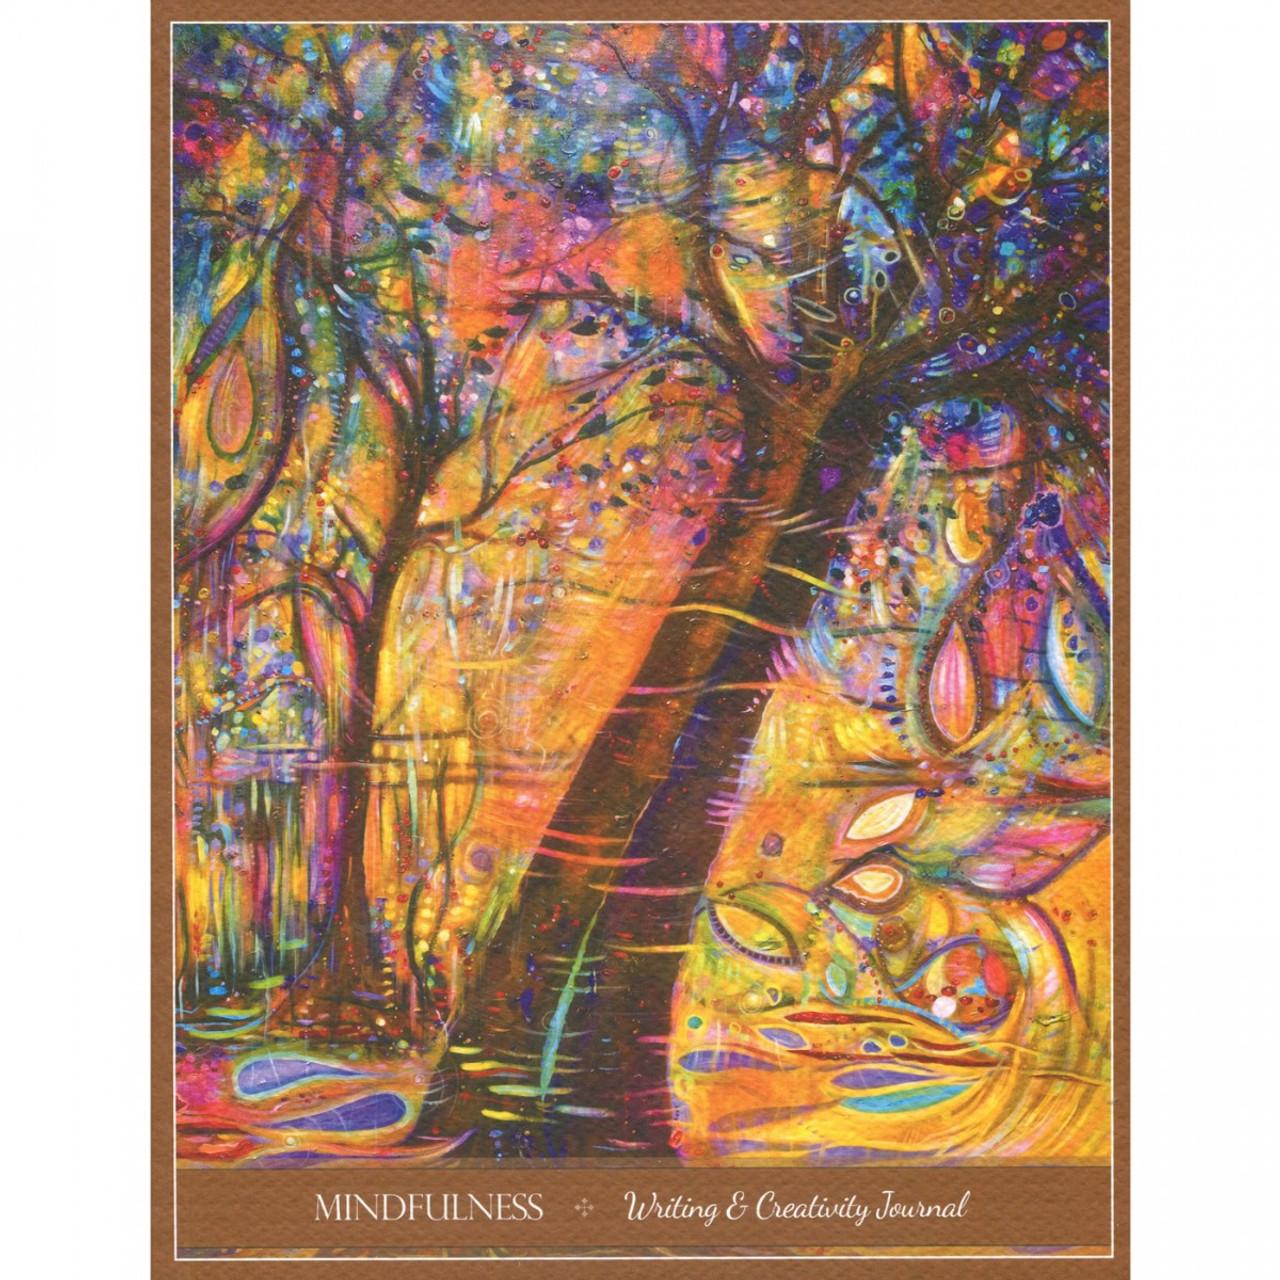 Mindfulness: Writing & Creativity Journal by Toni Carmine Salerno